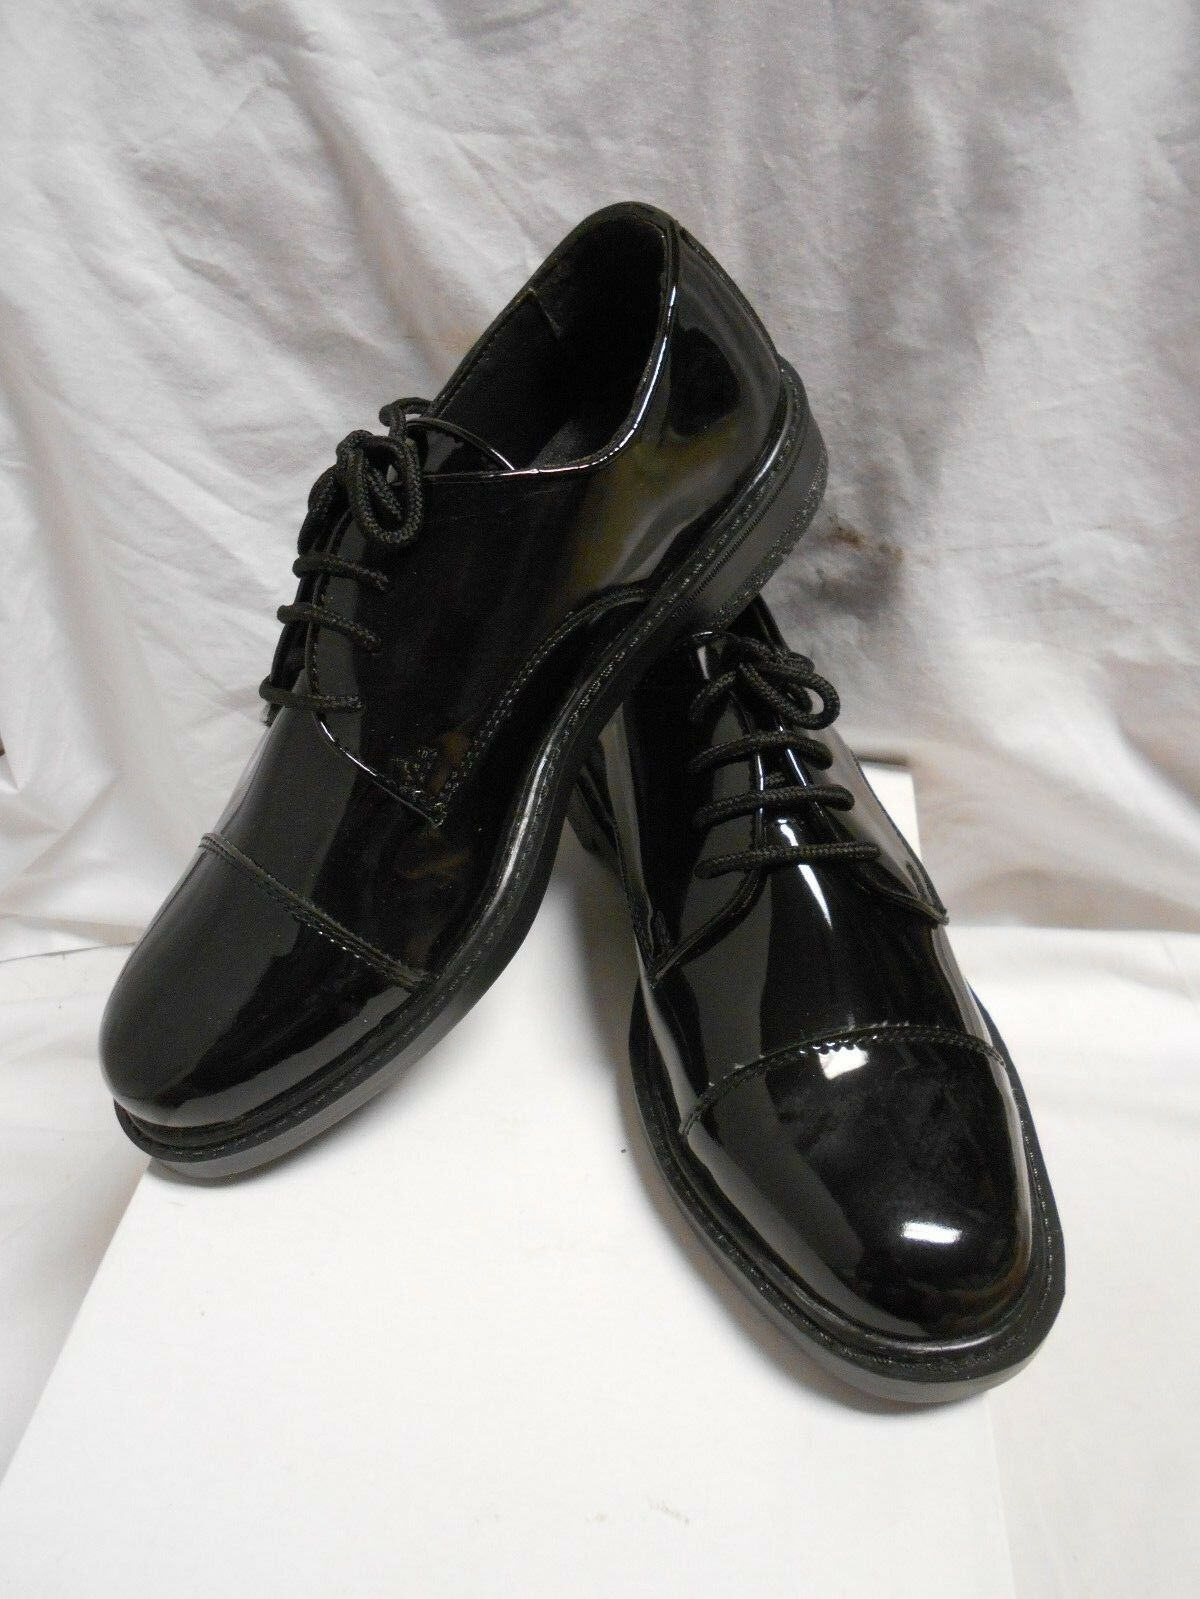 NWB Men's Black Oxford Patent Leather Cap Toe Oxford Black  Formal Wear Shoes Size 8M fdc7c5